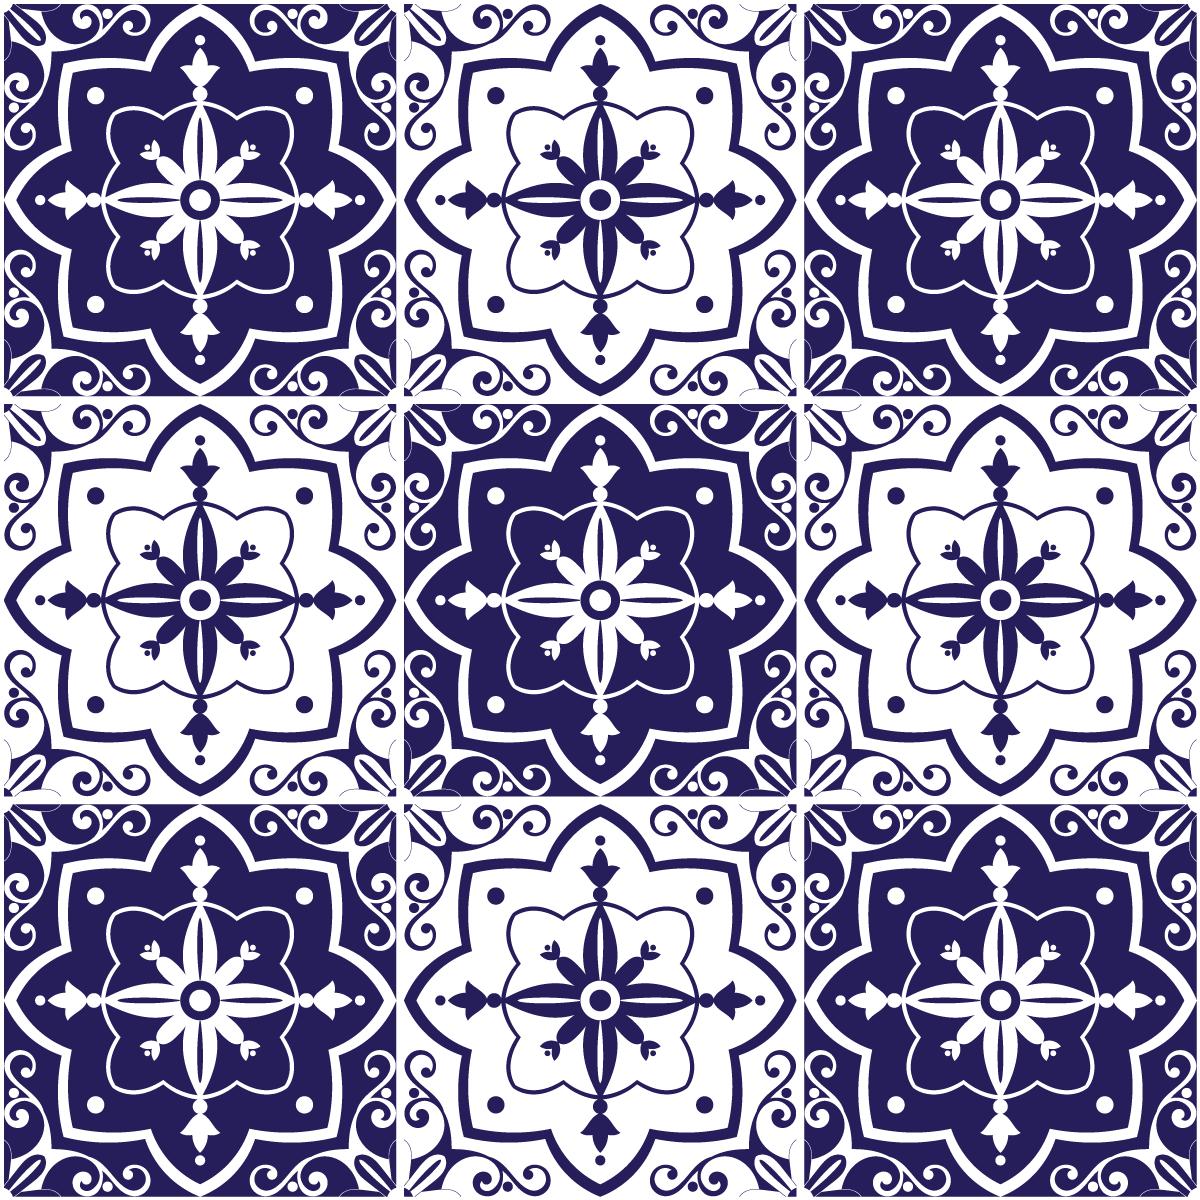 9 stickers carrelages azulejos carlota salle de bain et wc salle de bain ambiance sticker. Black Bedroom Furniture Sets. Home Design Ideas